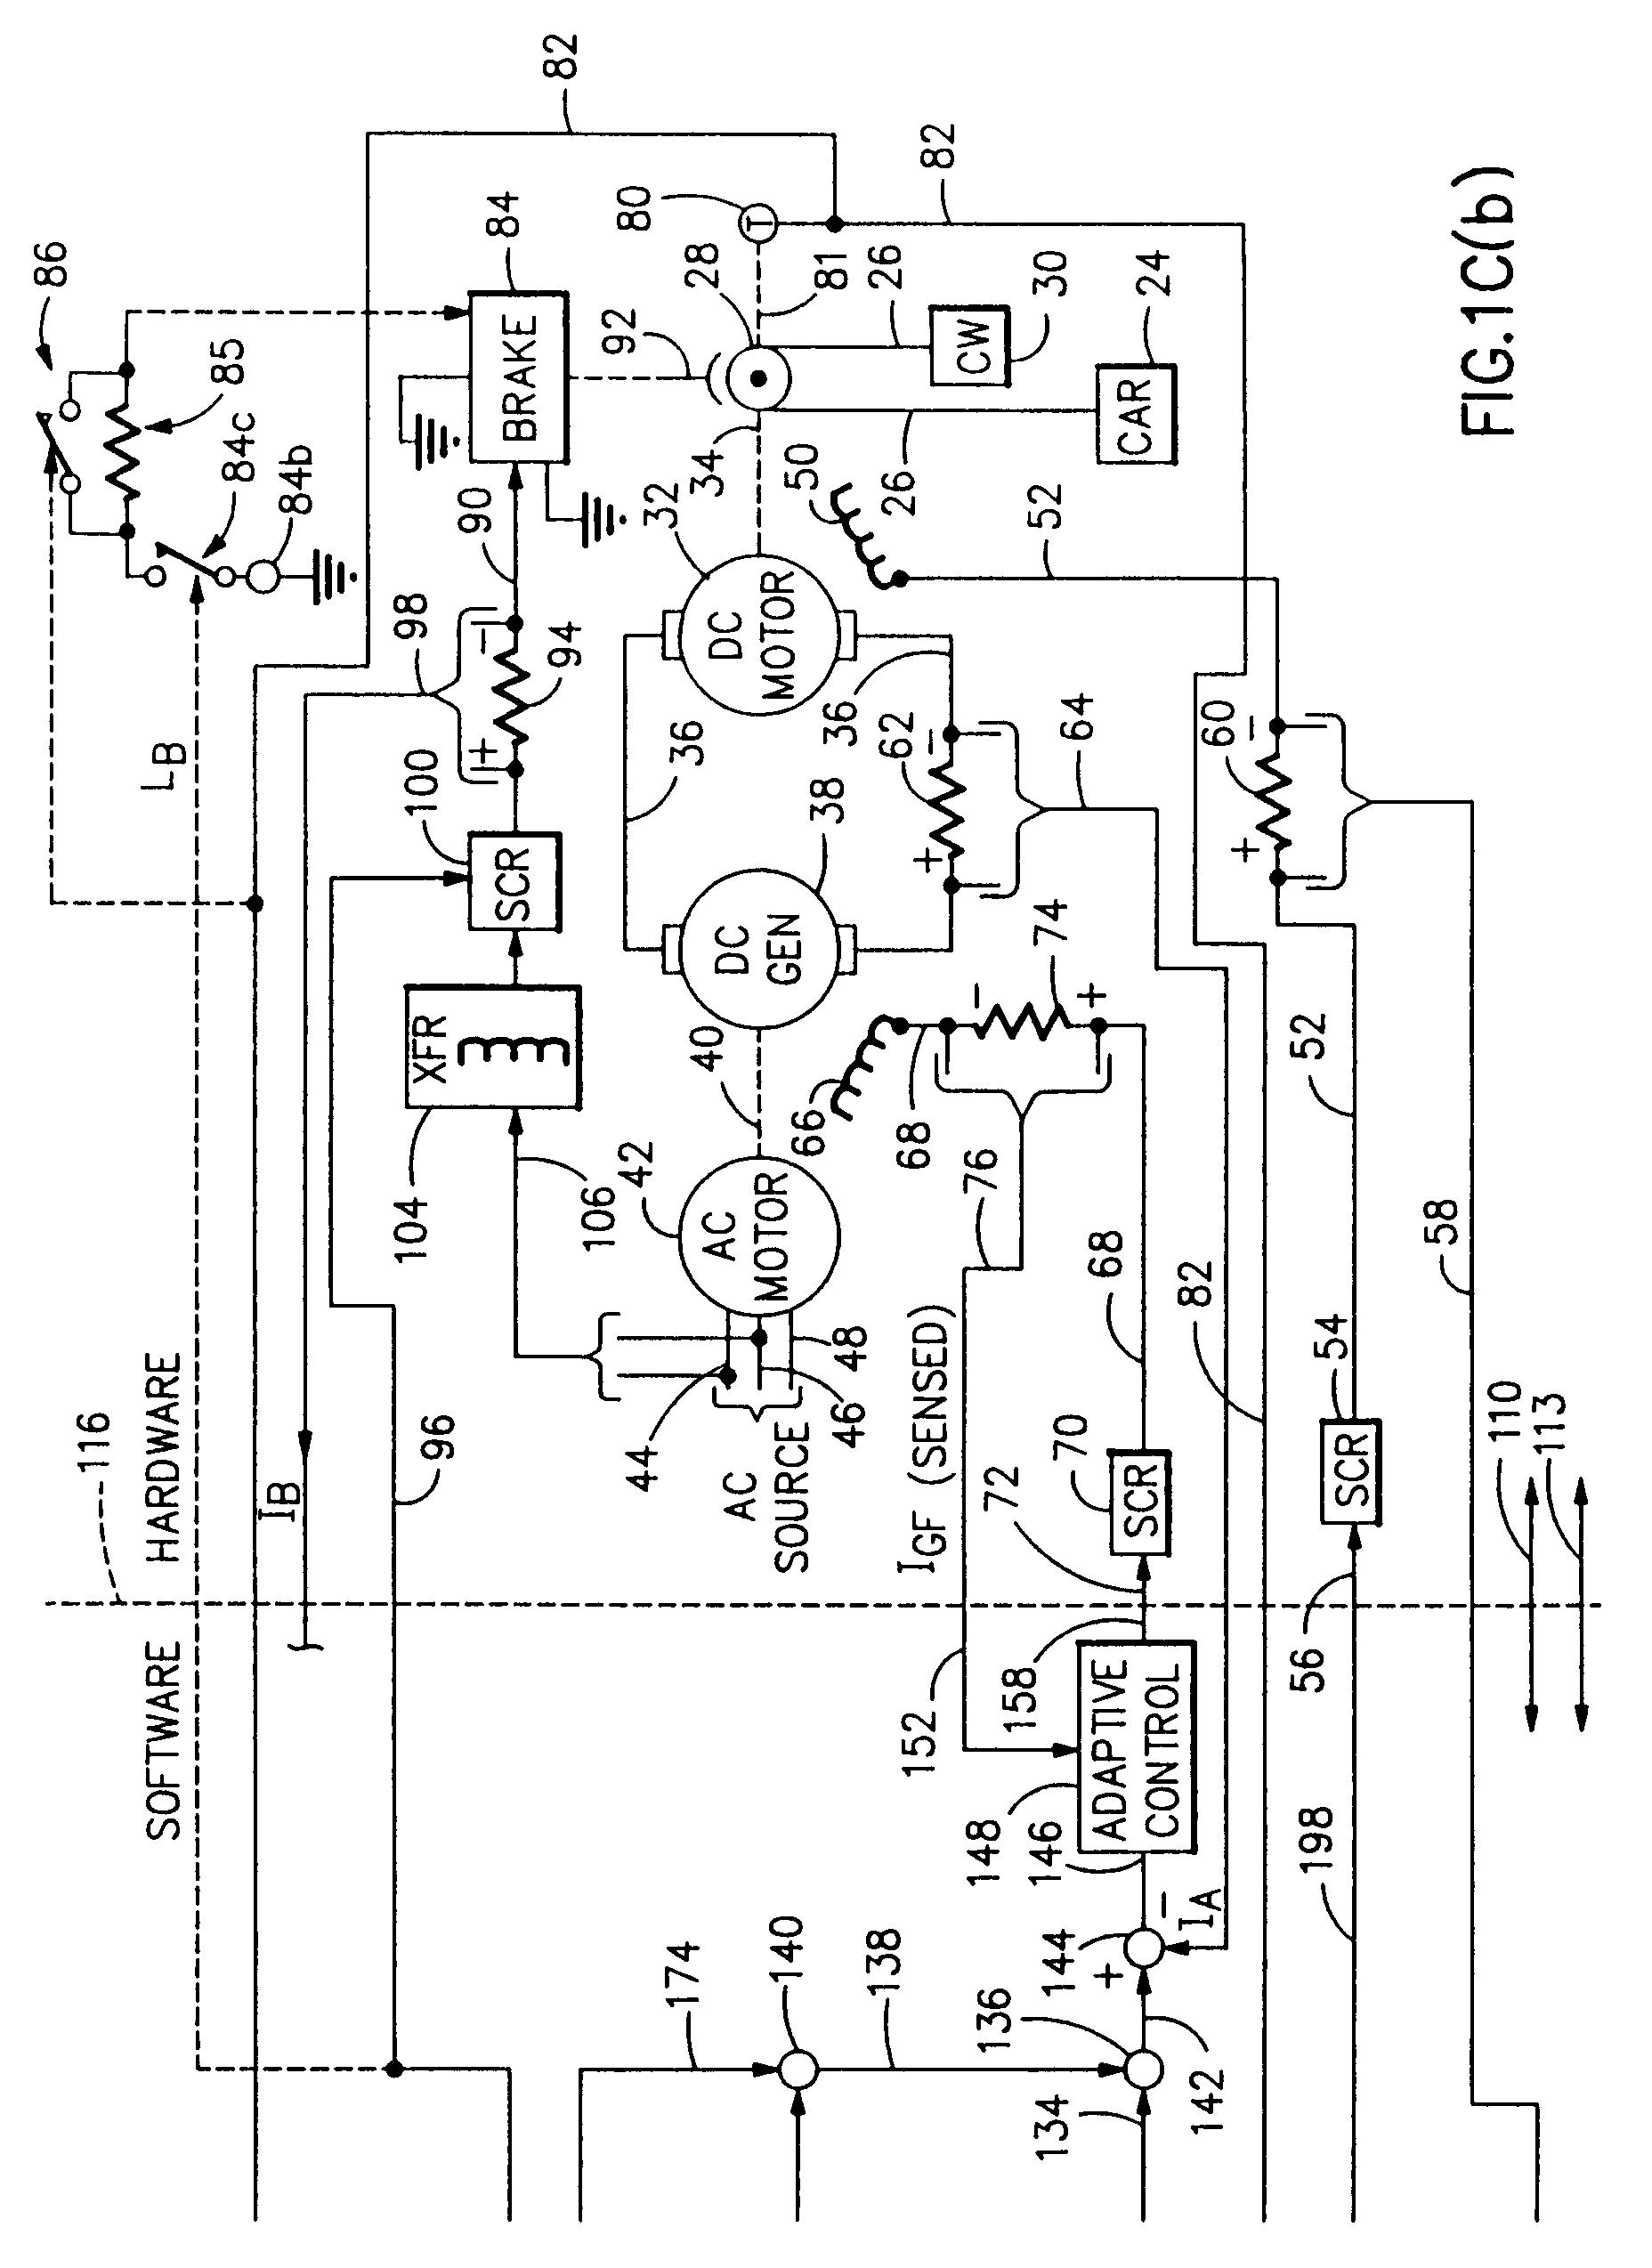 Elevator Controls Diagrams - Wiring Diagrams List